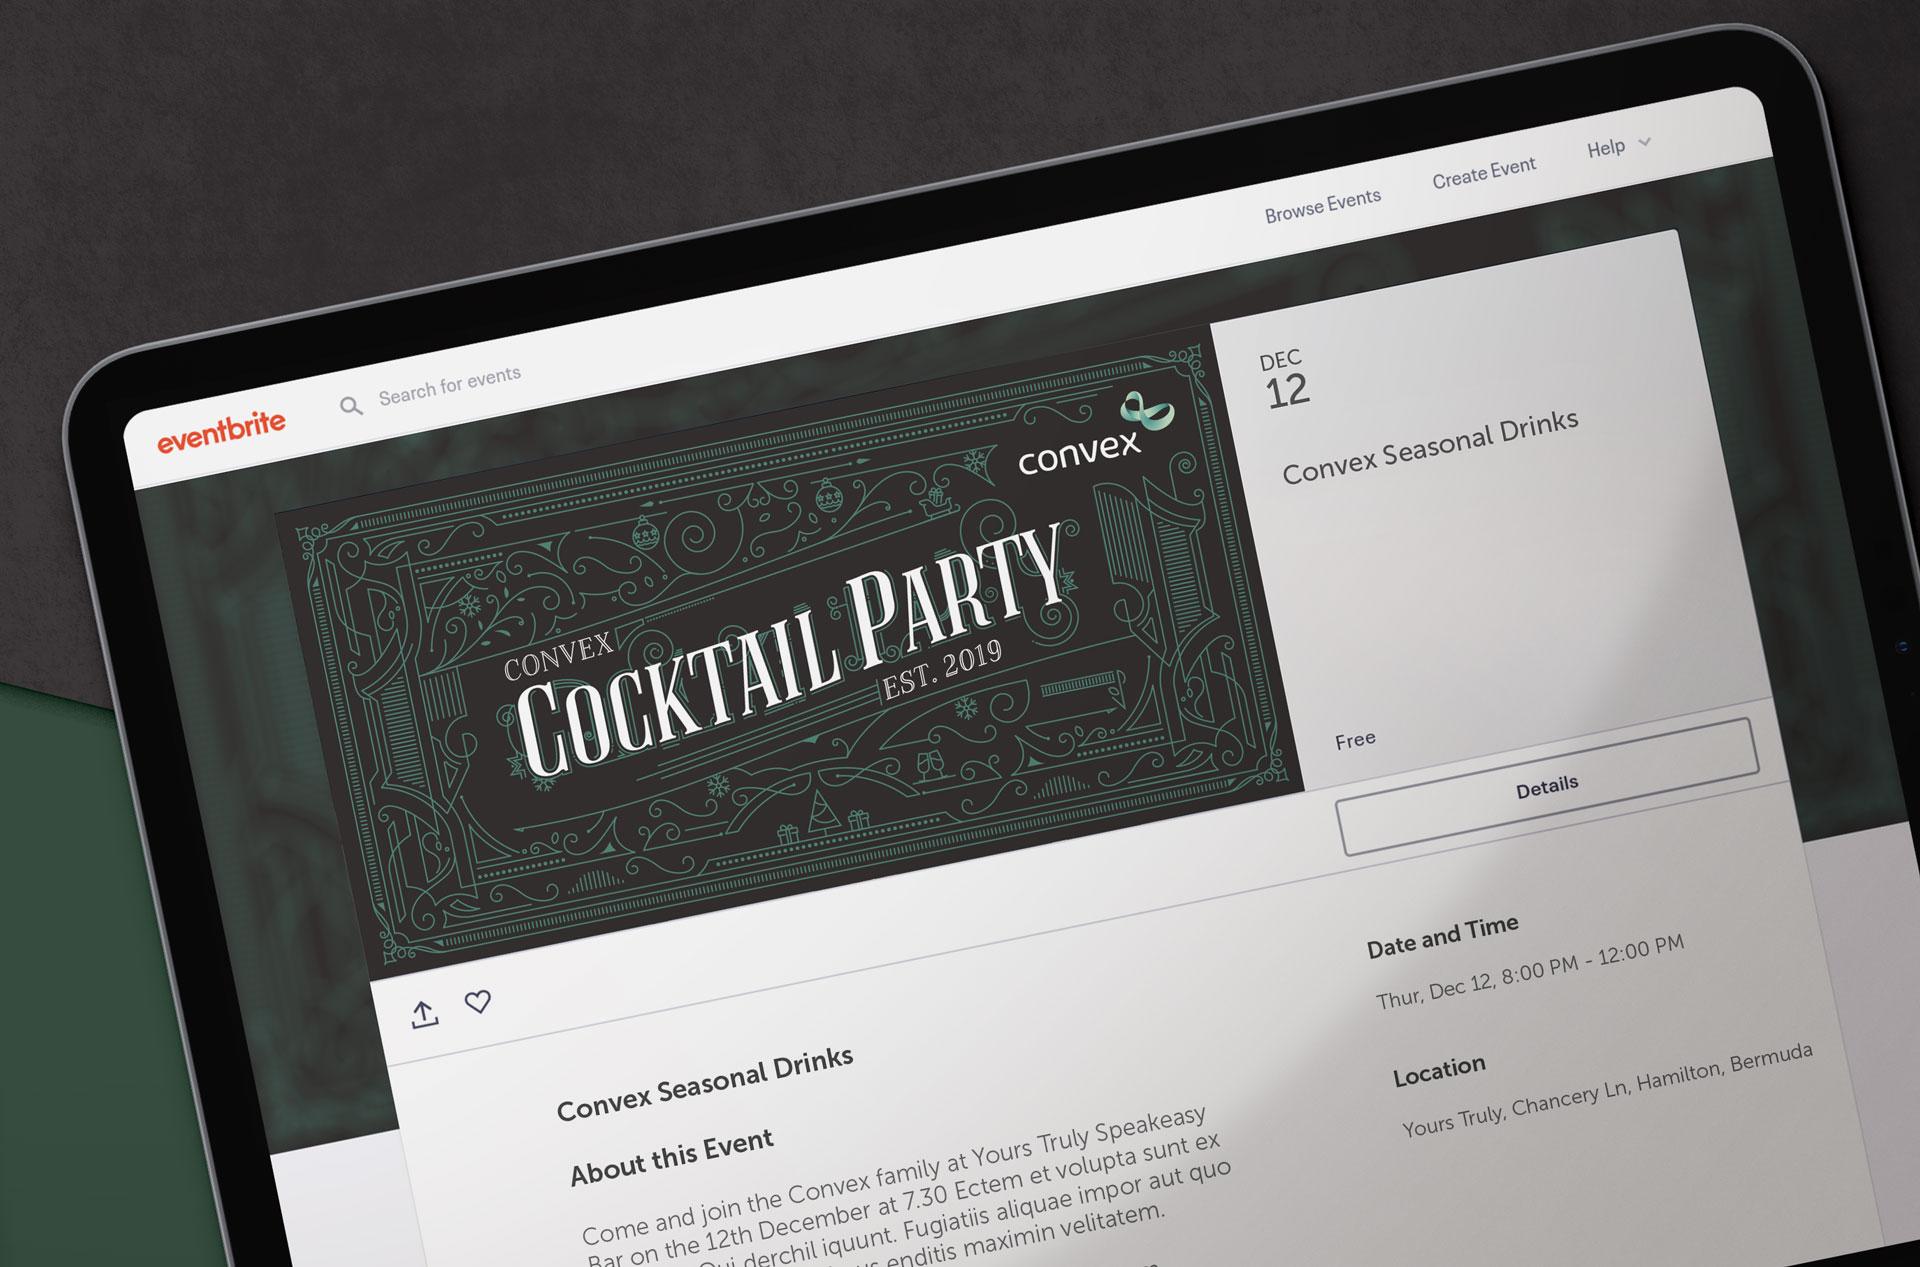 Glendale Creative Convex Speakeasy Cocktail Party Invite Design